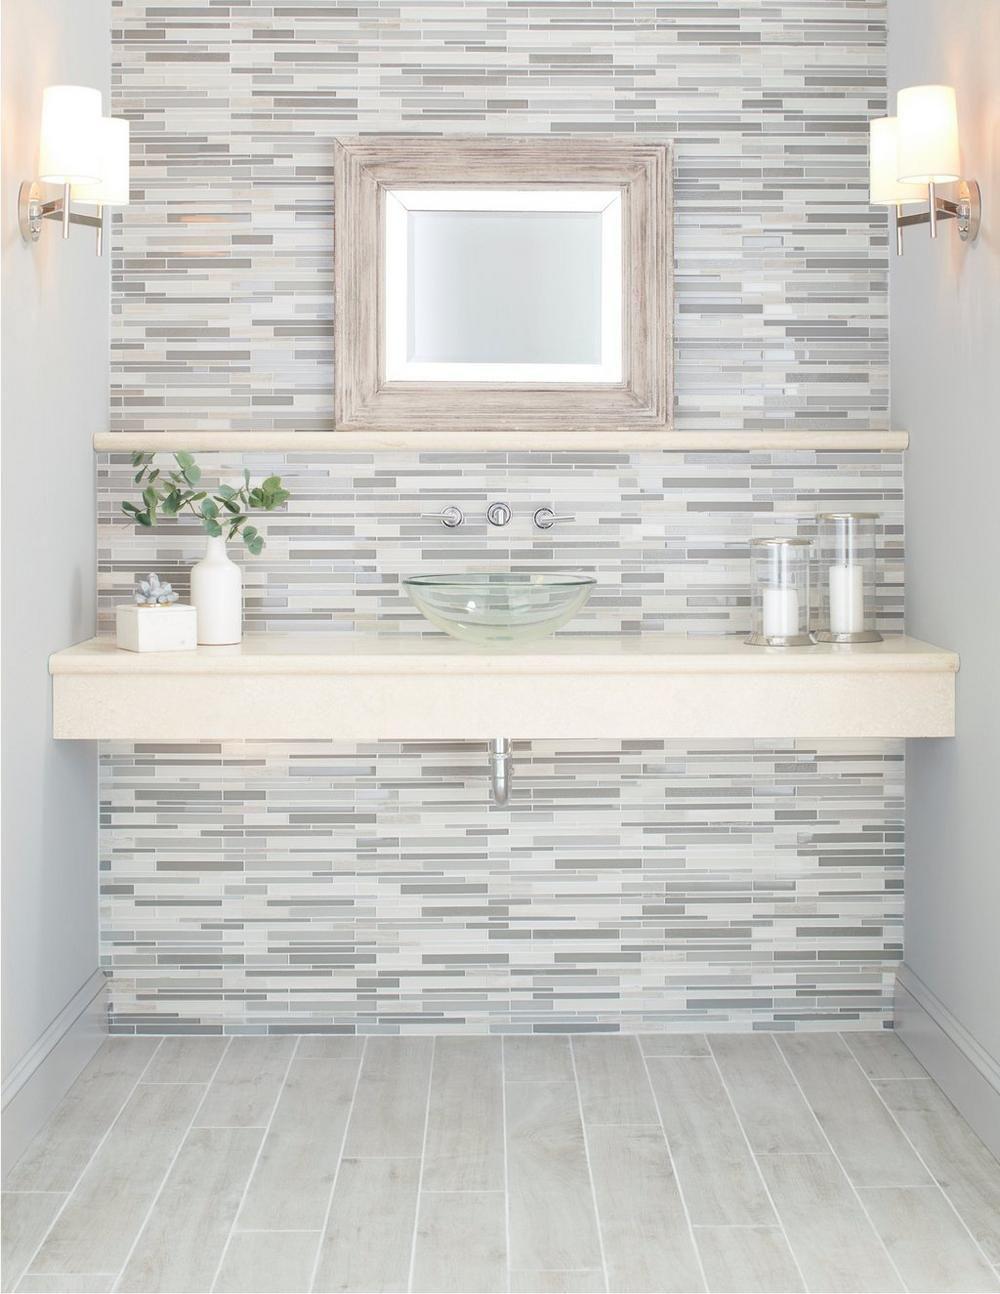 Tabula Fog Wood Plank Porcelain Tile Floor Decor Floor Design Floor Decor Bathrooms Remodel